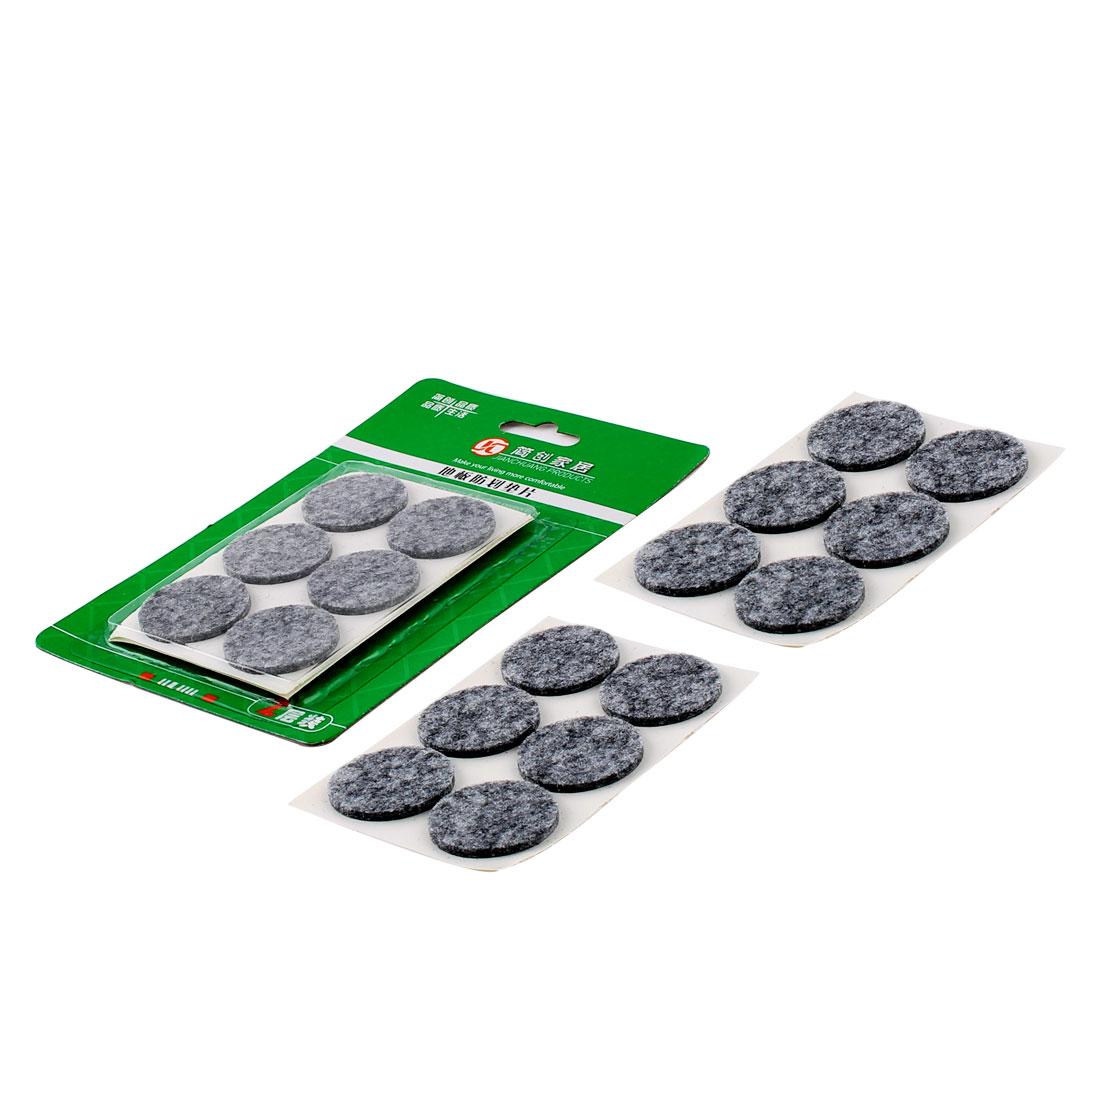 Houseware Protecting Floor Furniture Felt Pads Cushions Mats Gray 30mm Dia 24pcs